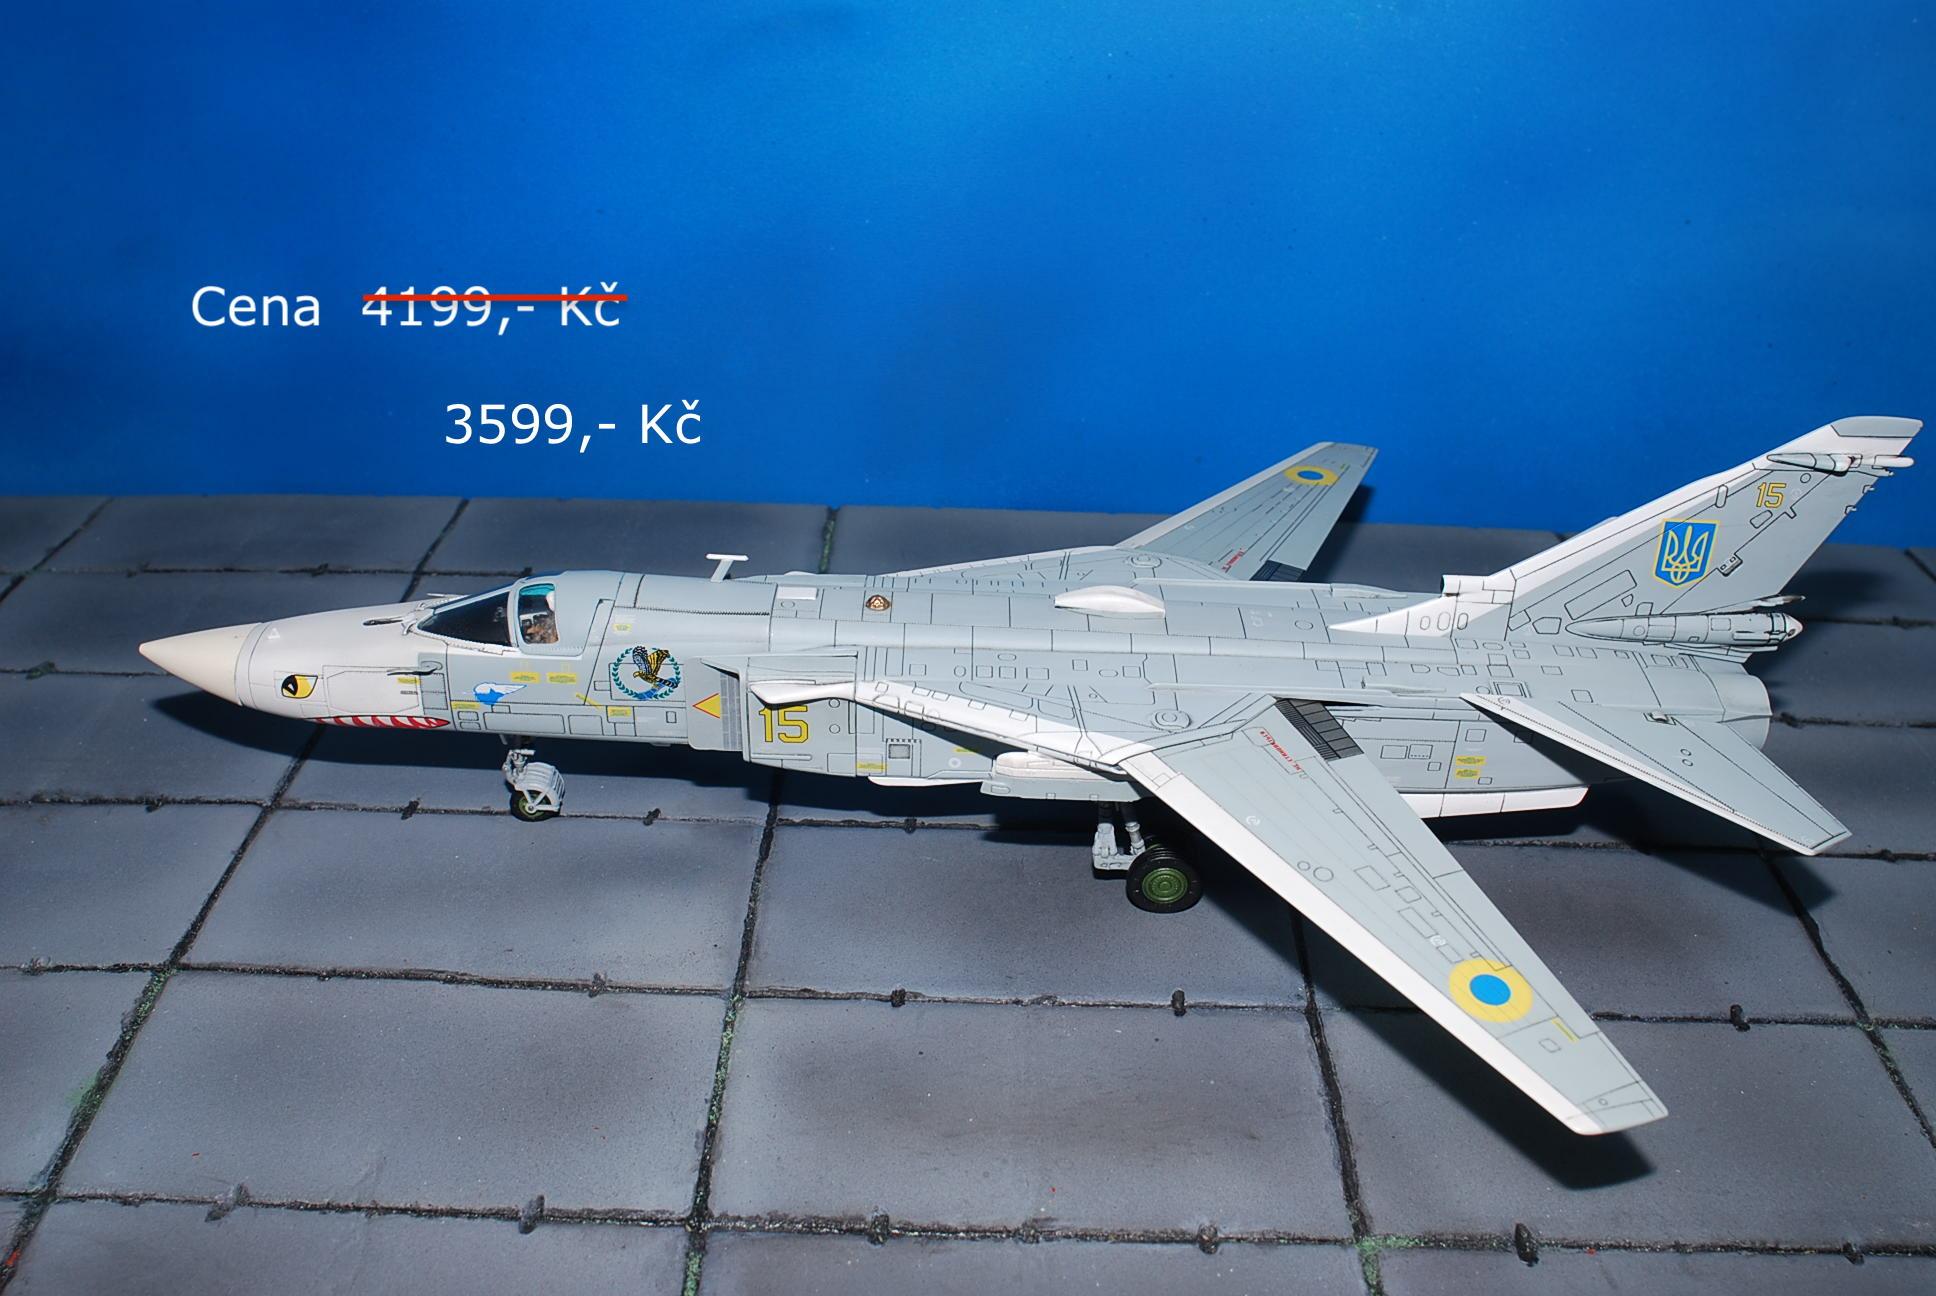 Su-24.Sukhoi Su-24.Fencer.Modely letadel.Diecast models aircraft.Calibre Wings CA722402. Modely vrtulníků. Diecast models helicopters. Diecast models cars. Modely vojenské techniky. Diecast models military vehicles. Modely raket. Diecast models rockets. Sběratelské modely. Hotové modely. Sběratelské modely letadel. Kovové modely.